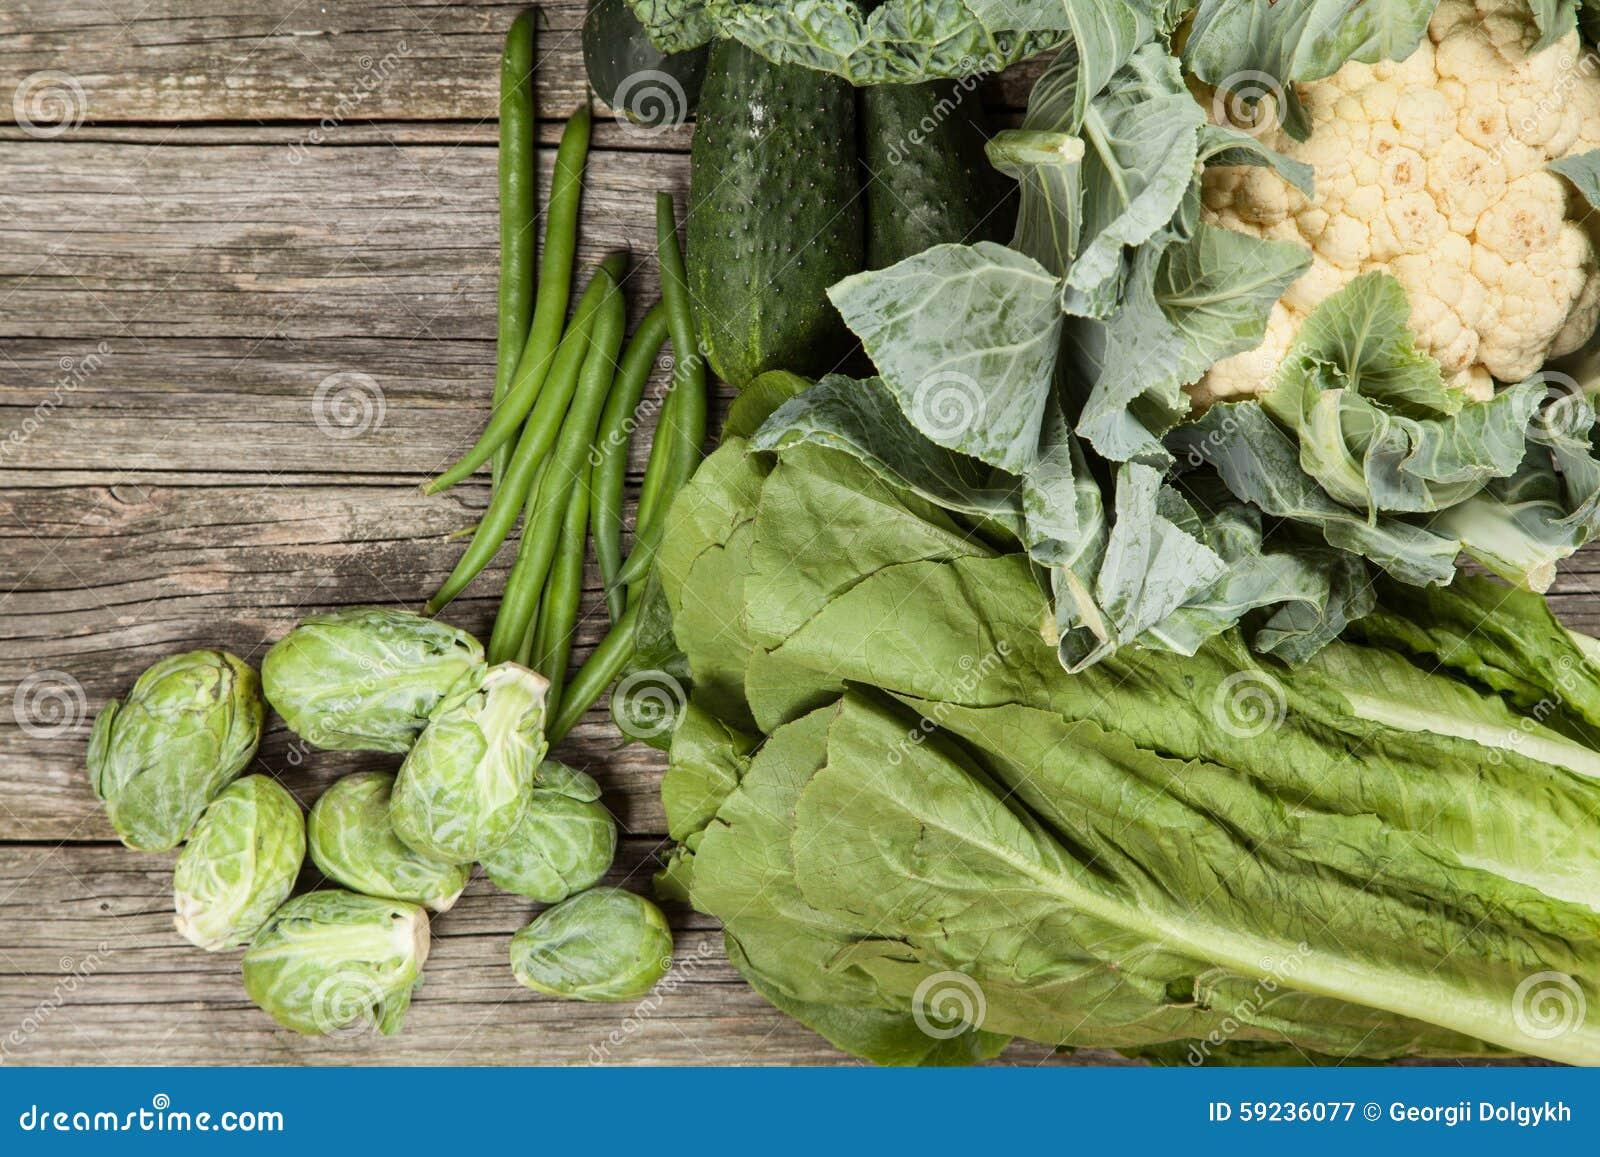 Surtido de verduras verdes